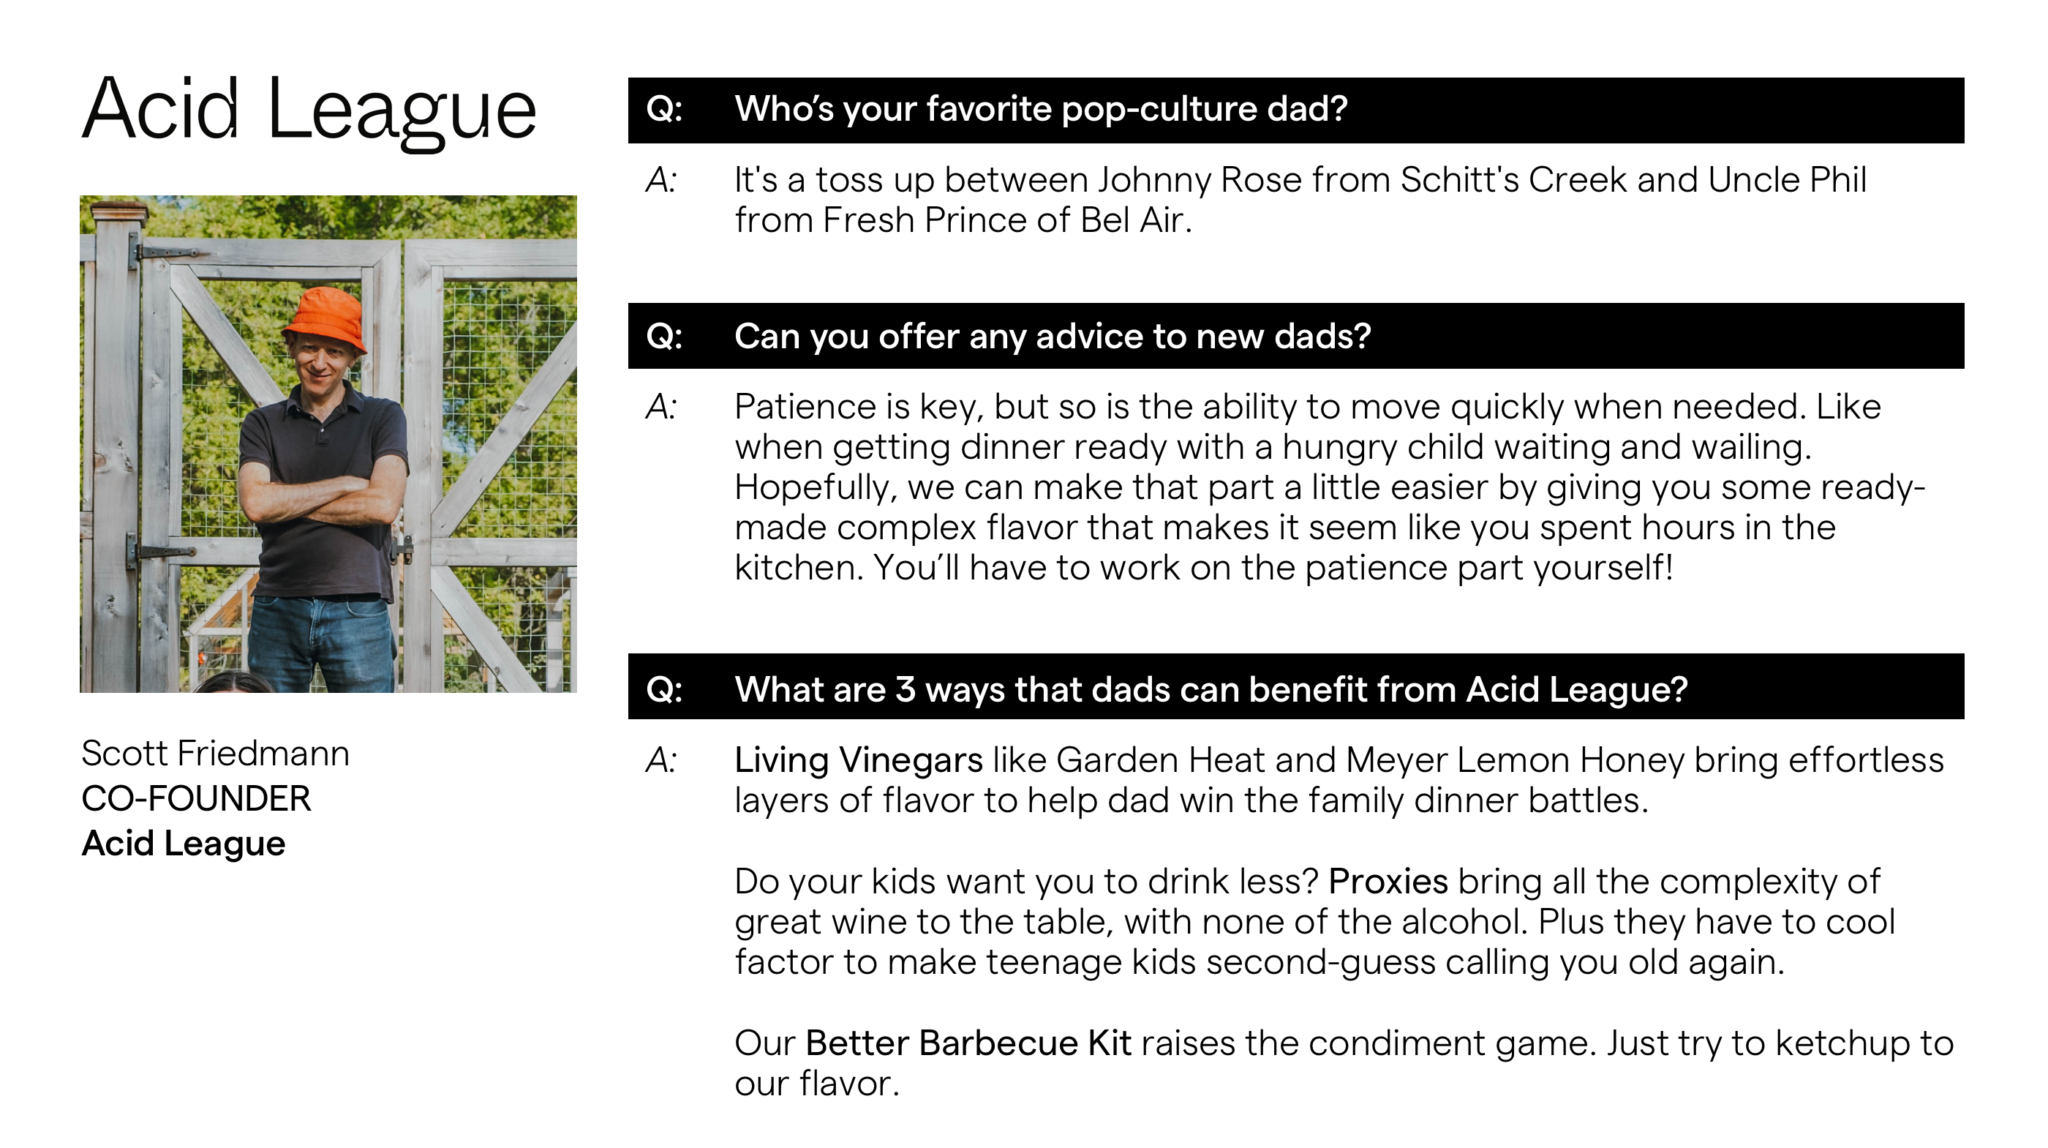 Scott Friedmann Acid League Founder Advanced Essentials Father's Day Gift Guide